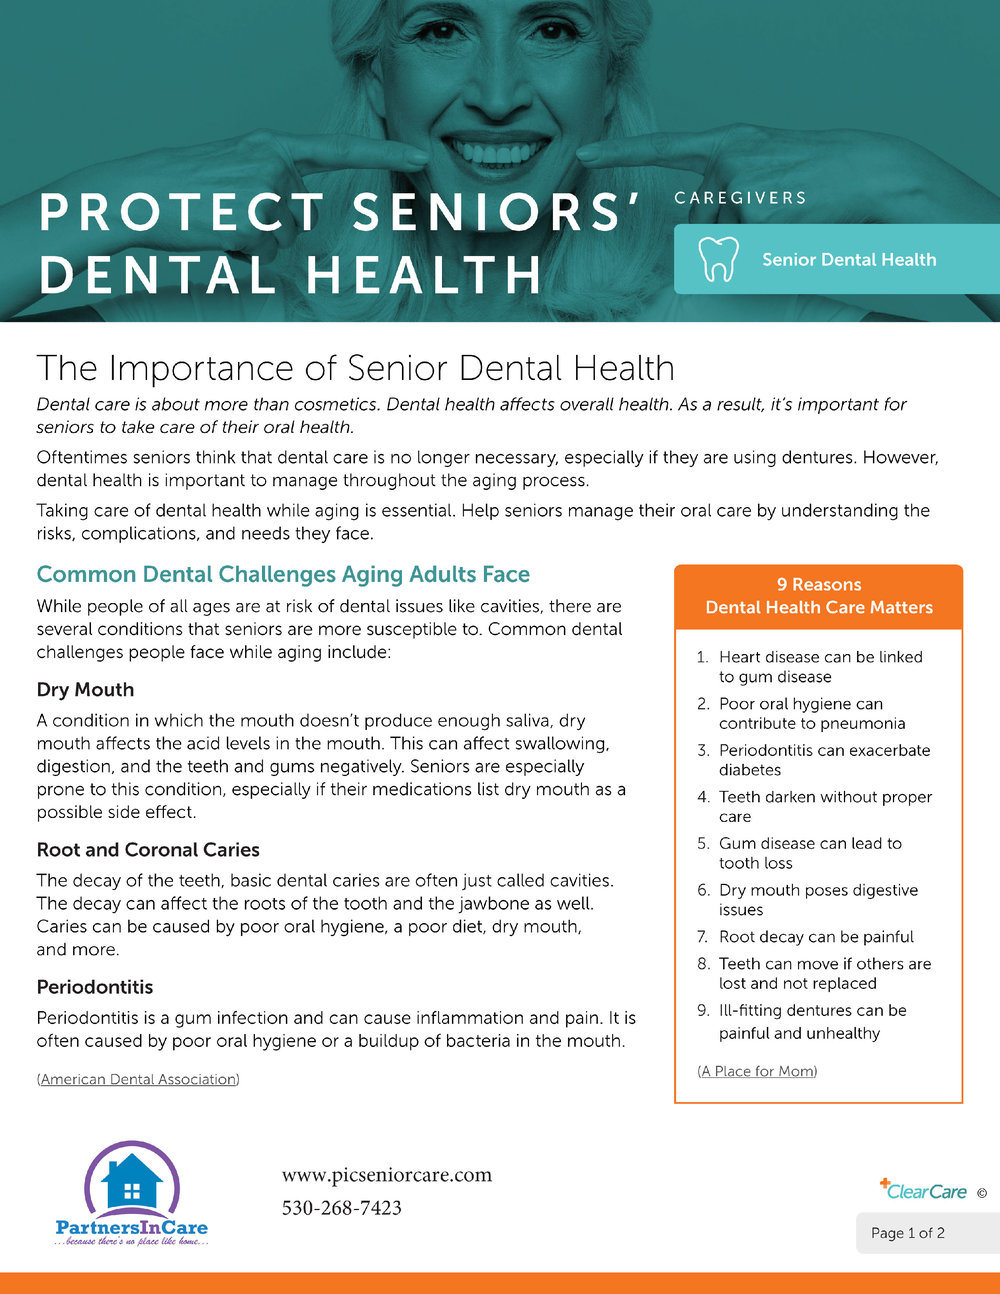 0818-ProtectSeniors DentalHealth-GenericCMYK_Page_1-01.jpg